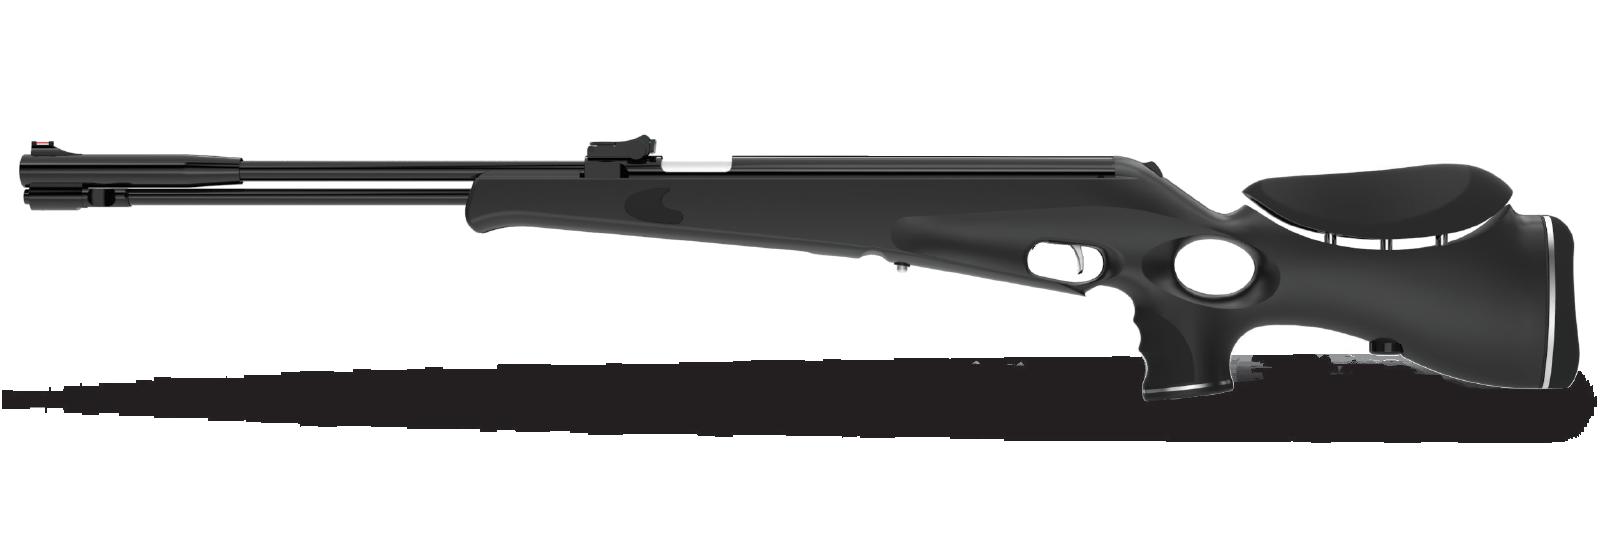 HighTech 100X BLACK